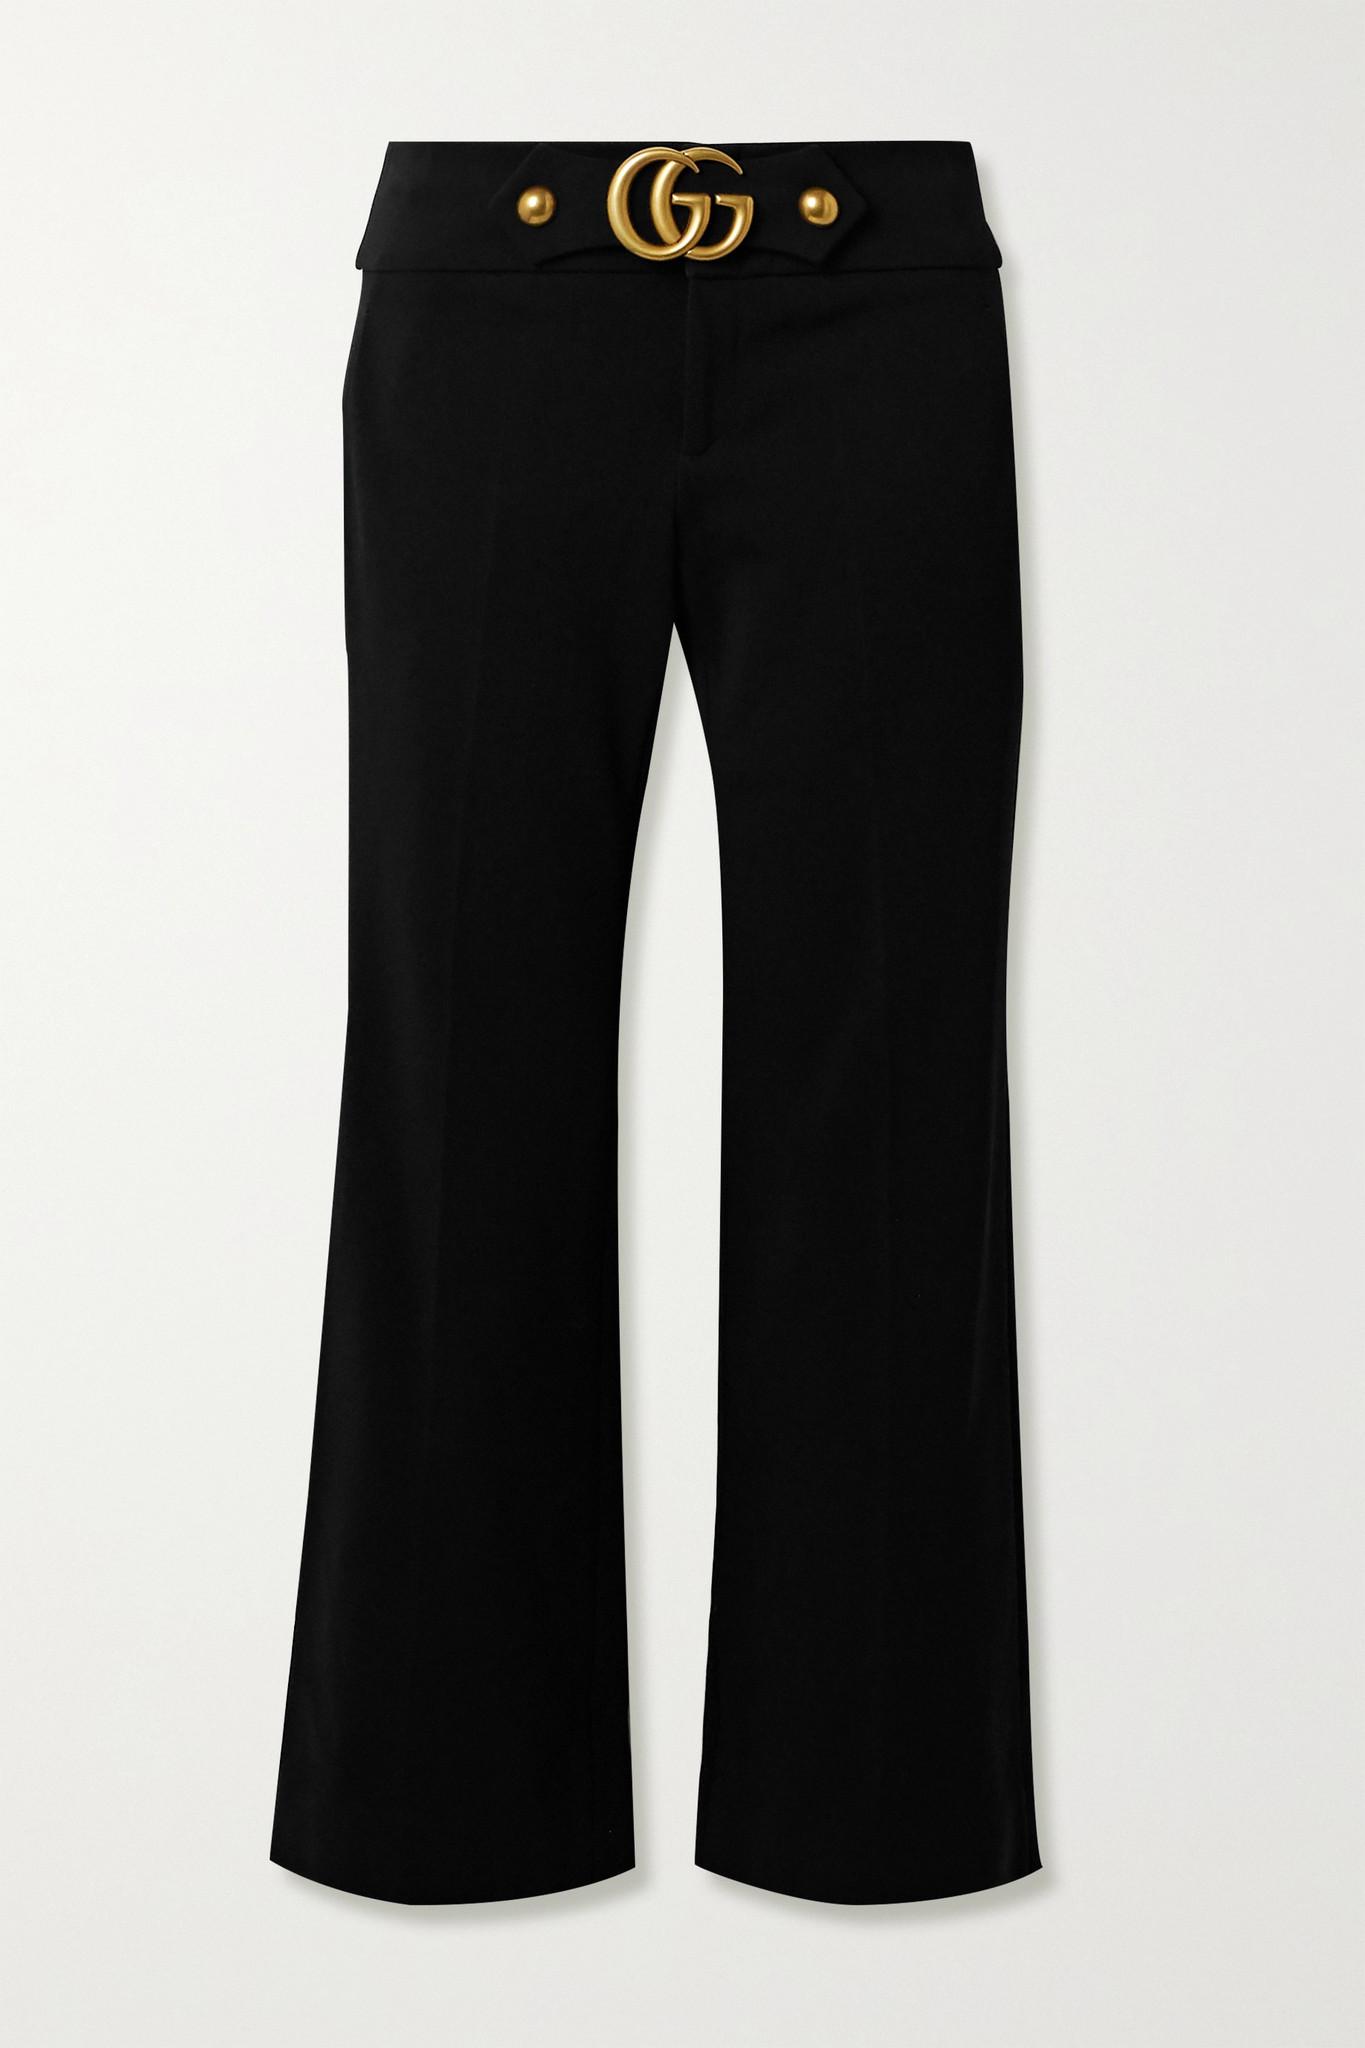 GUCCI - 带缀饰弹力绉纱喇叭裤 - 黑色 - IT46